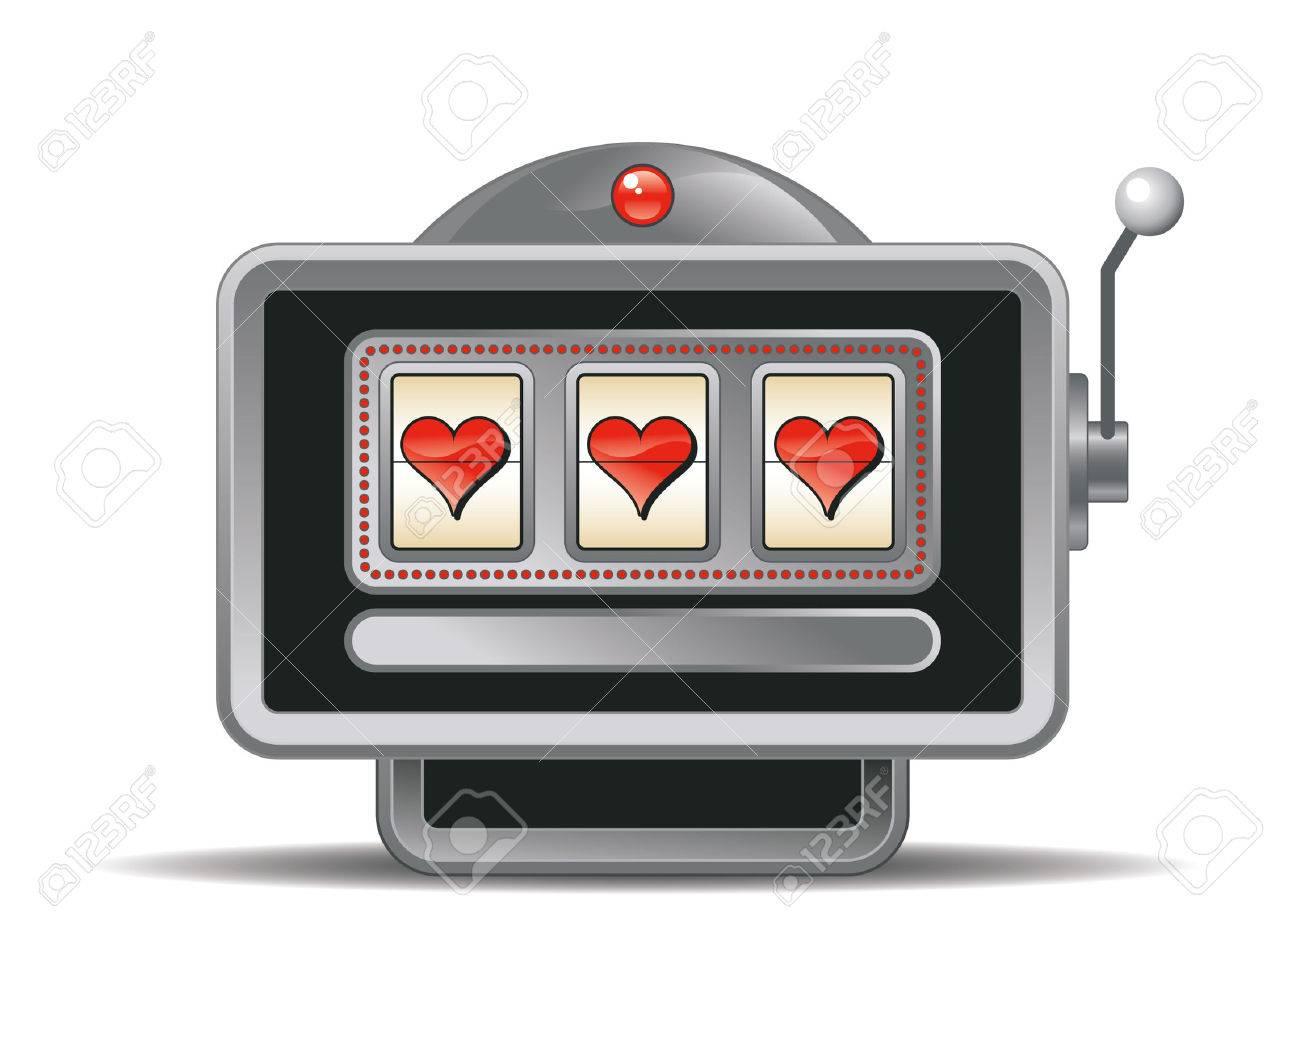 slot-machine Stock Vector - 8030373